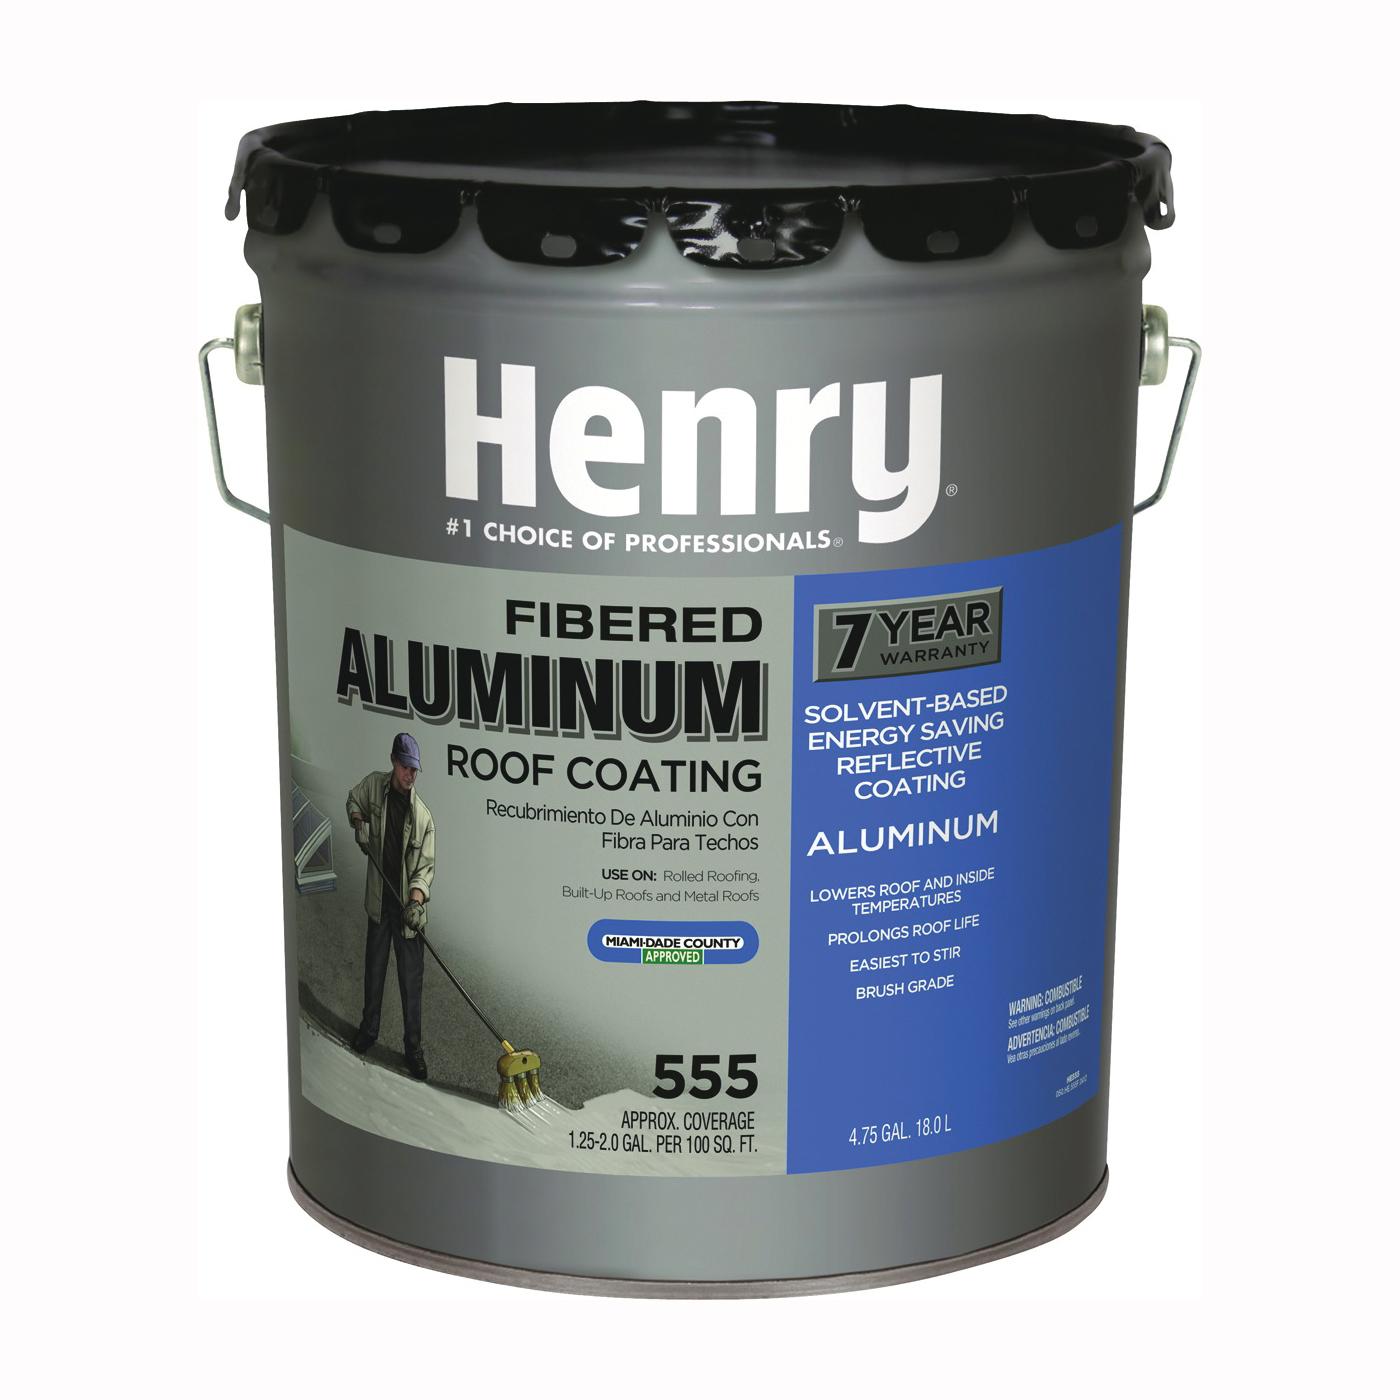 Picture of Henry HE555019 Aluminum Roof Coating, Black, 18 L, Pail, Liquid